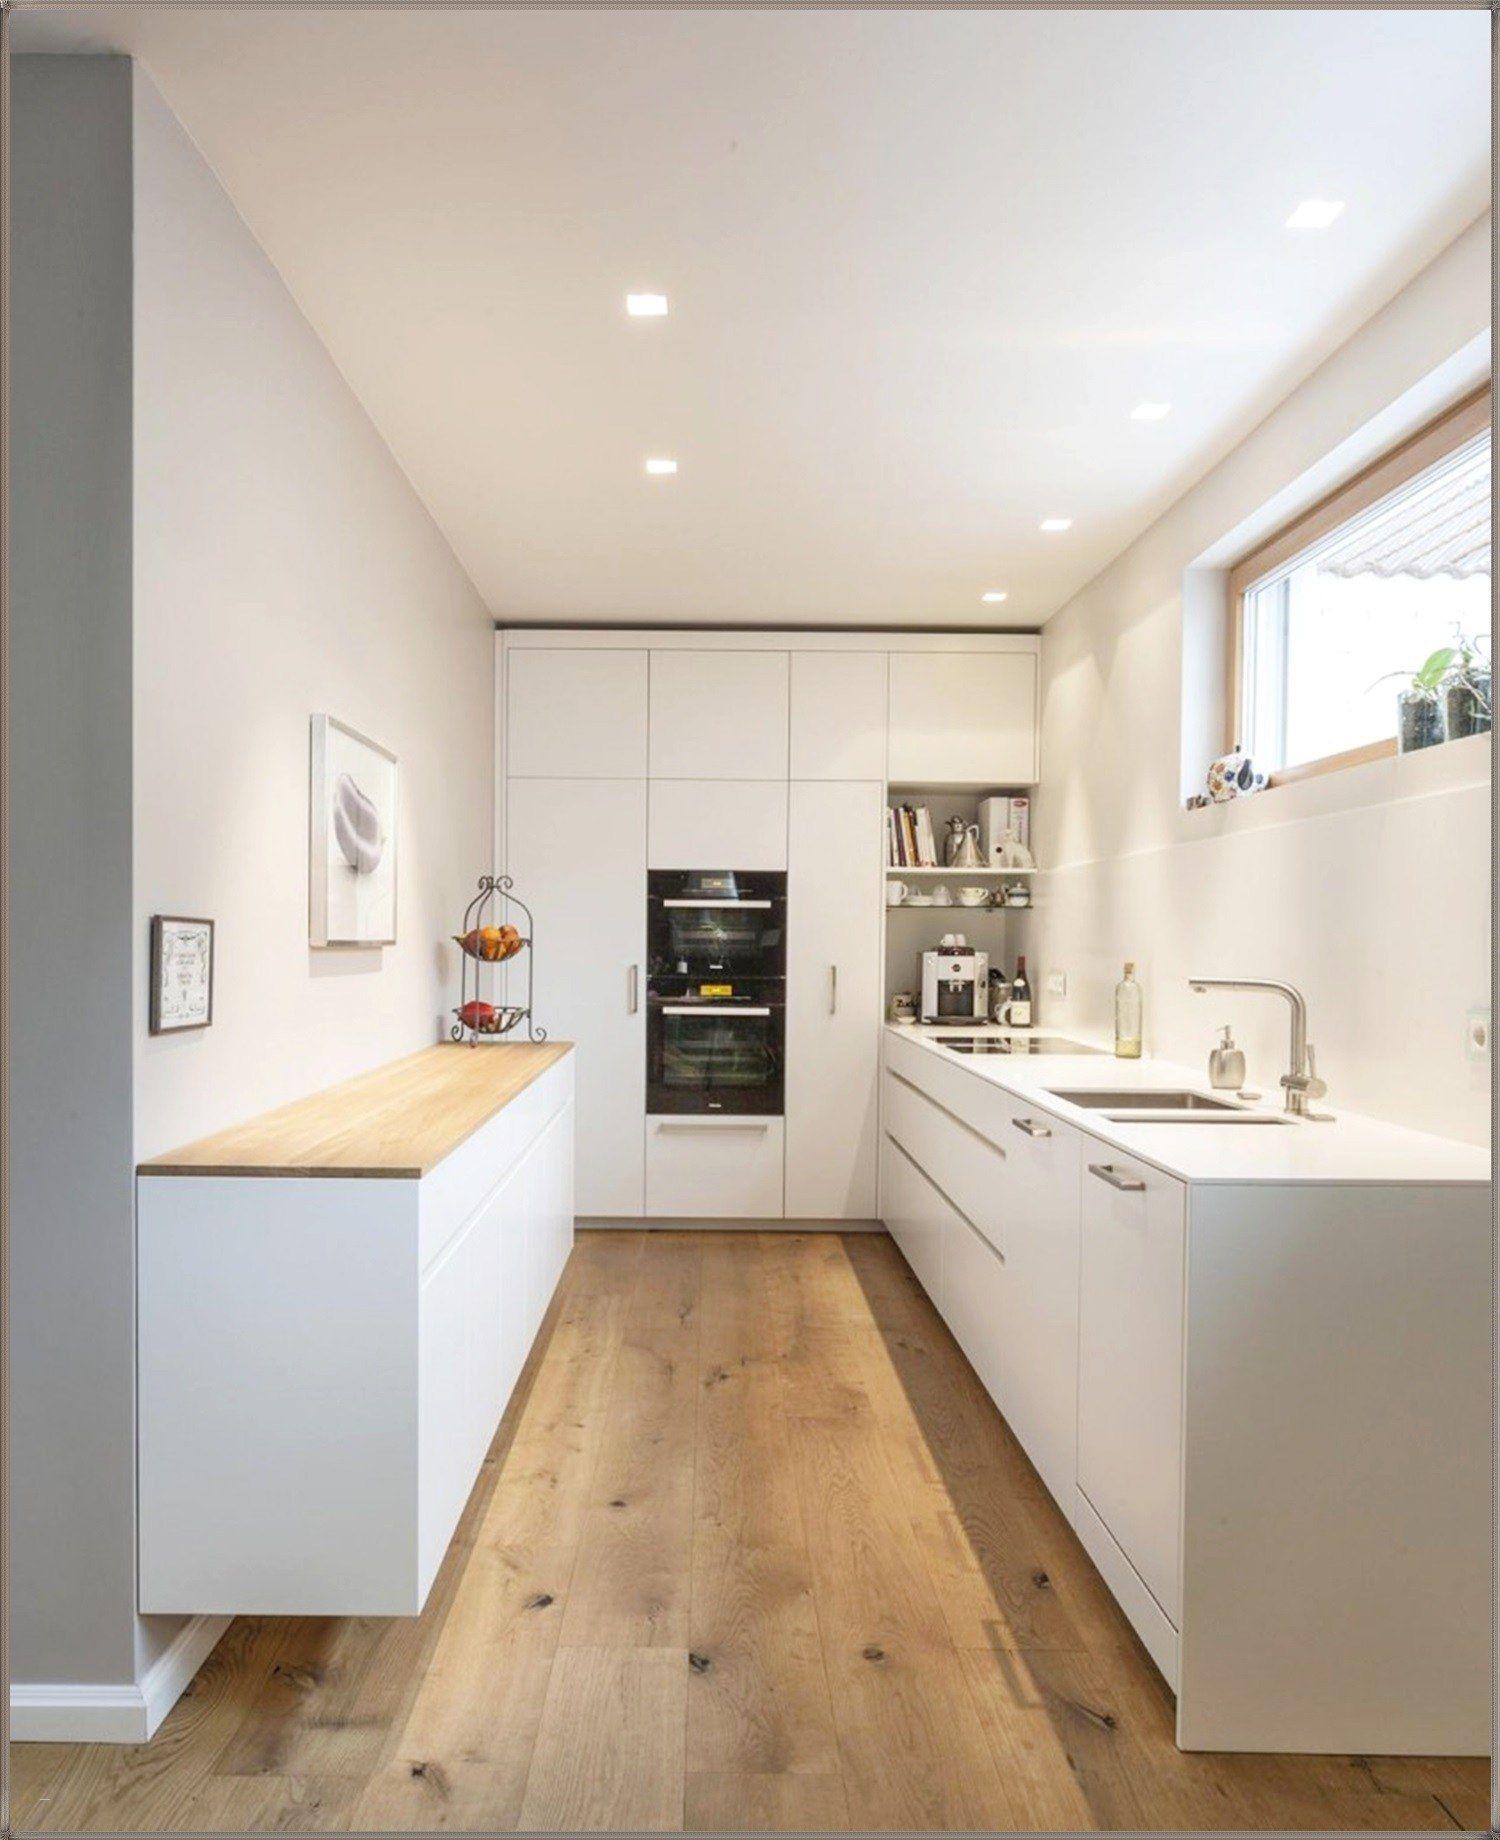 k chen in polen wohn design. Black Bedroom Furniture Sets. Home Design Ideas